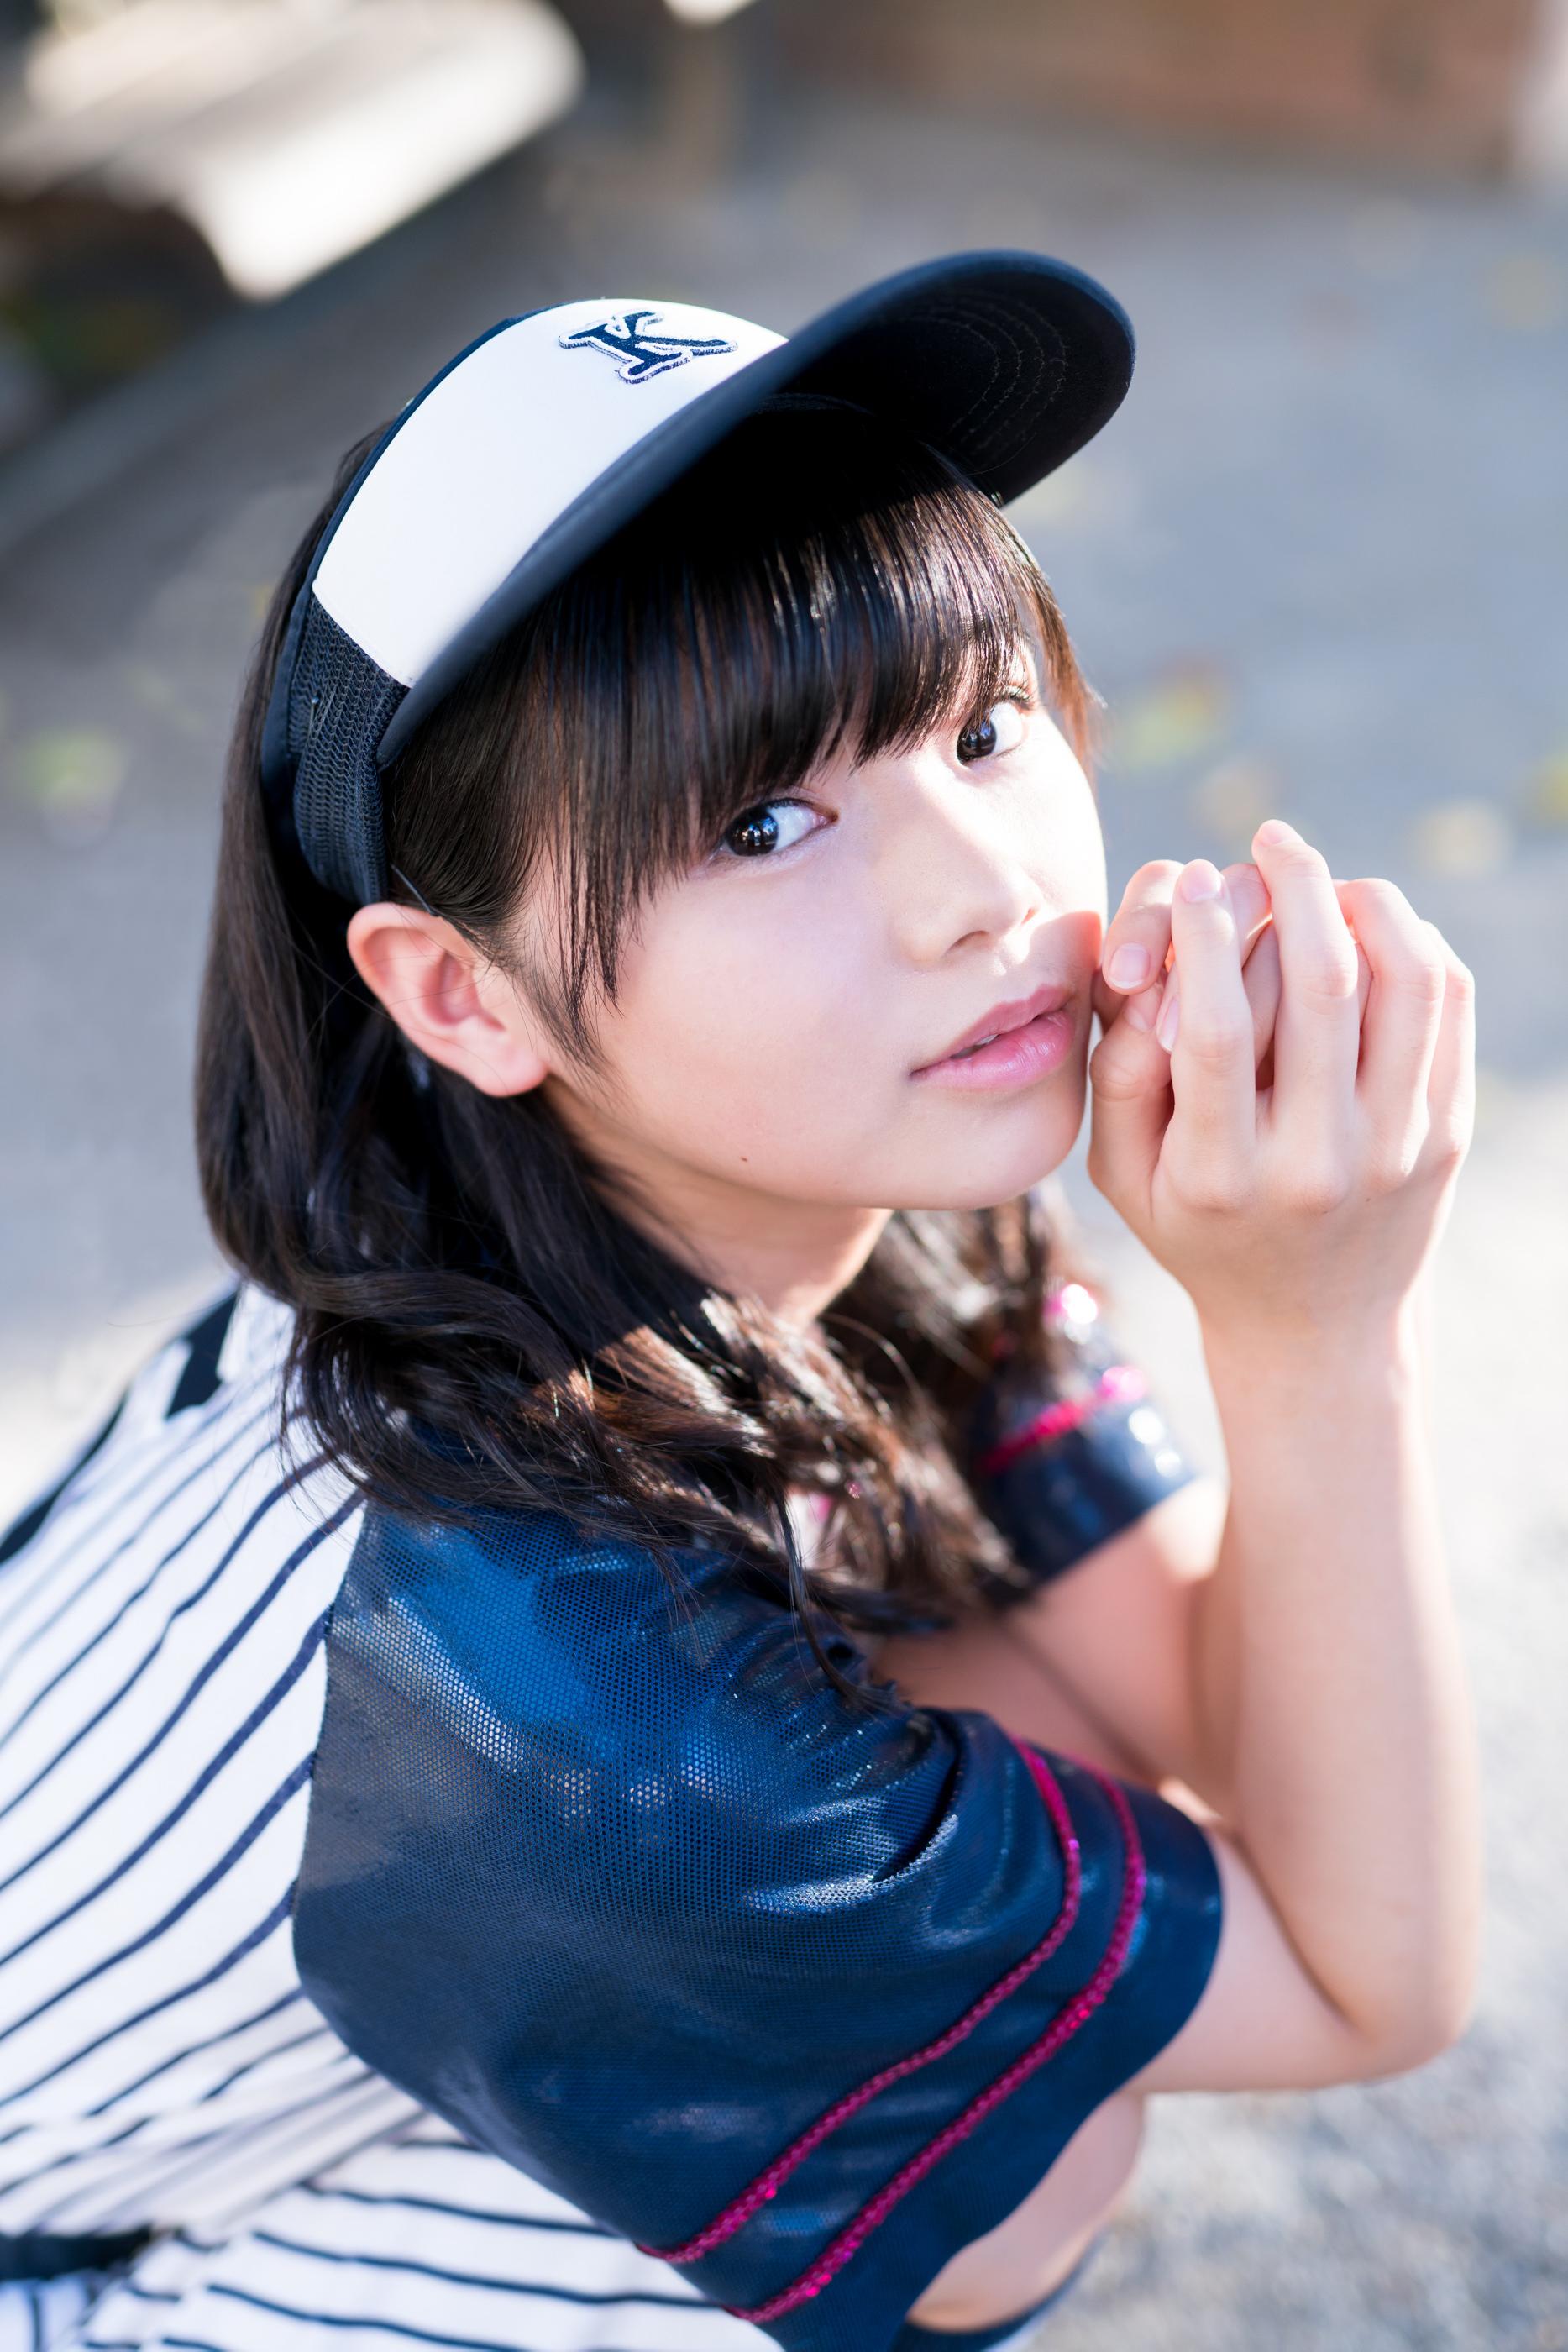 【JS】女子小学生 低学年画像スレPart3【JS】 [無断転載禁止]©bbspink.comfc2>1本 YouTube動画>7本 ->画像>3370枚